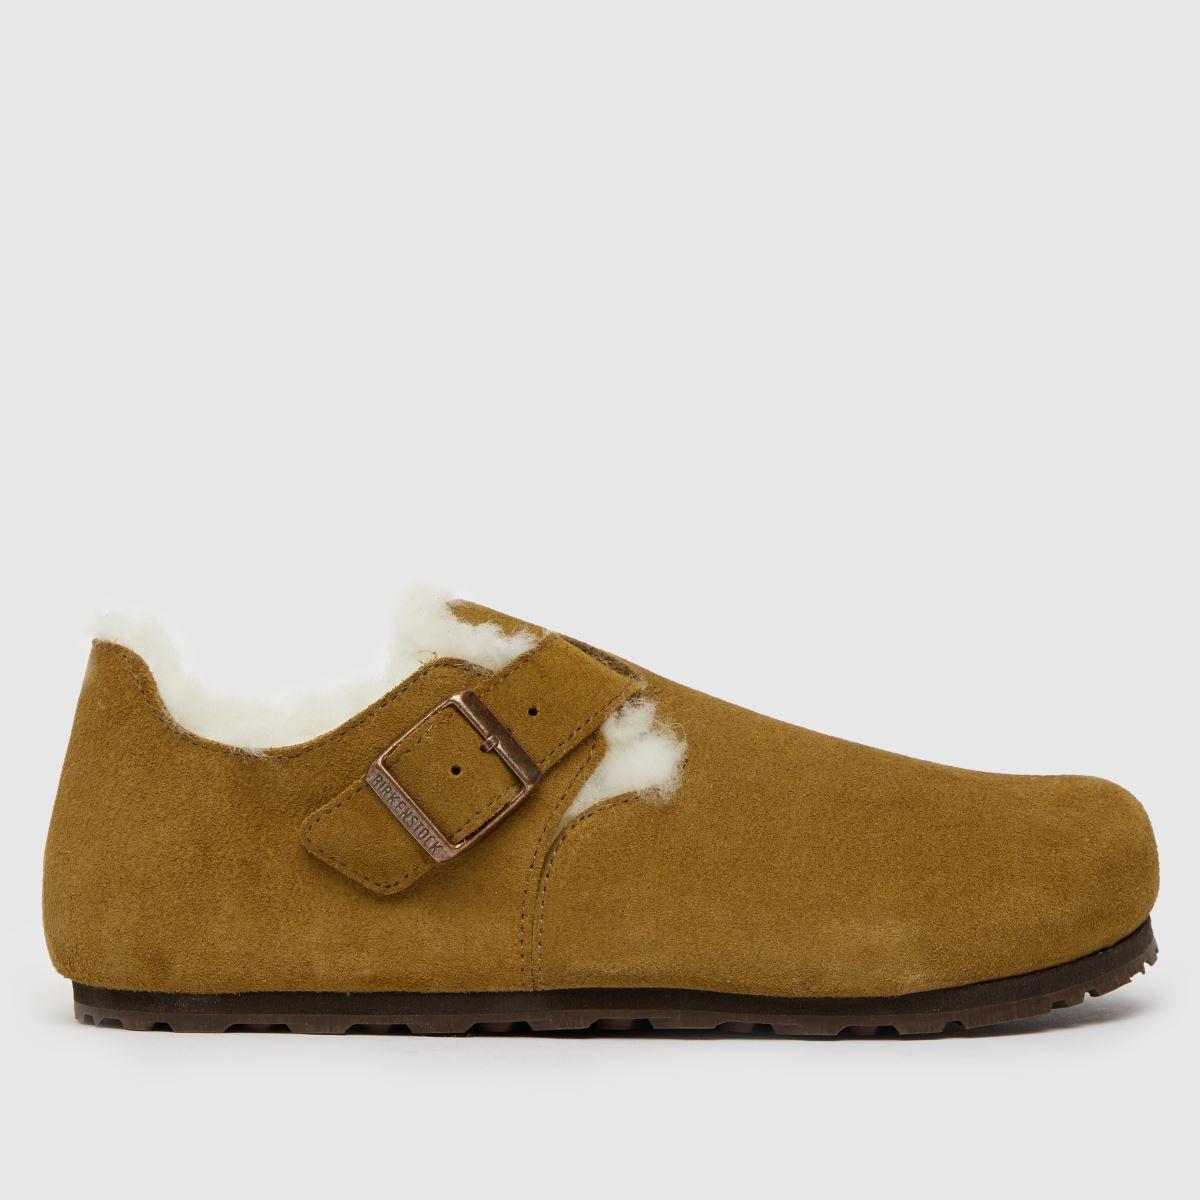 BIRKENSTOCK Tan London Shearling Sandals